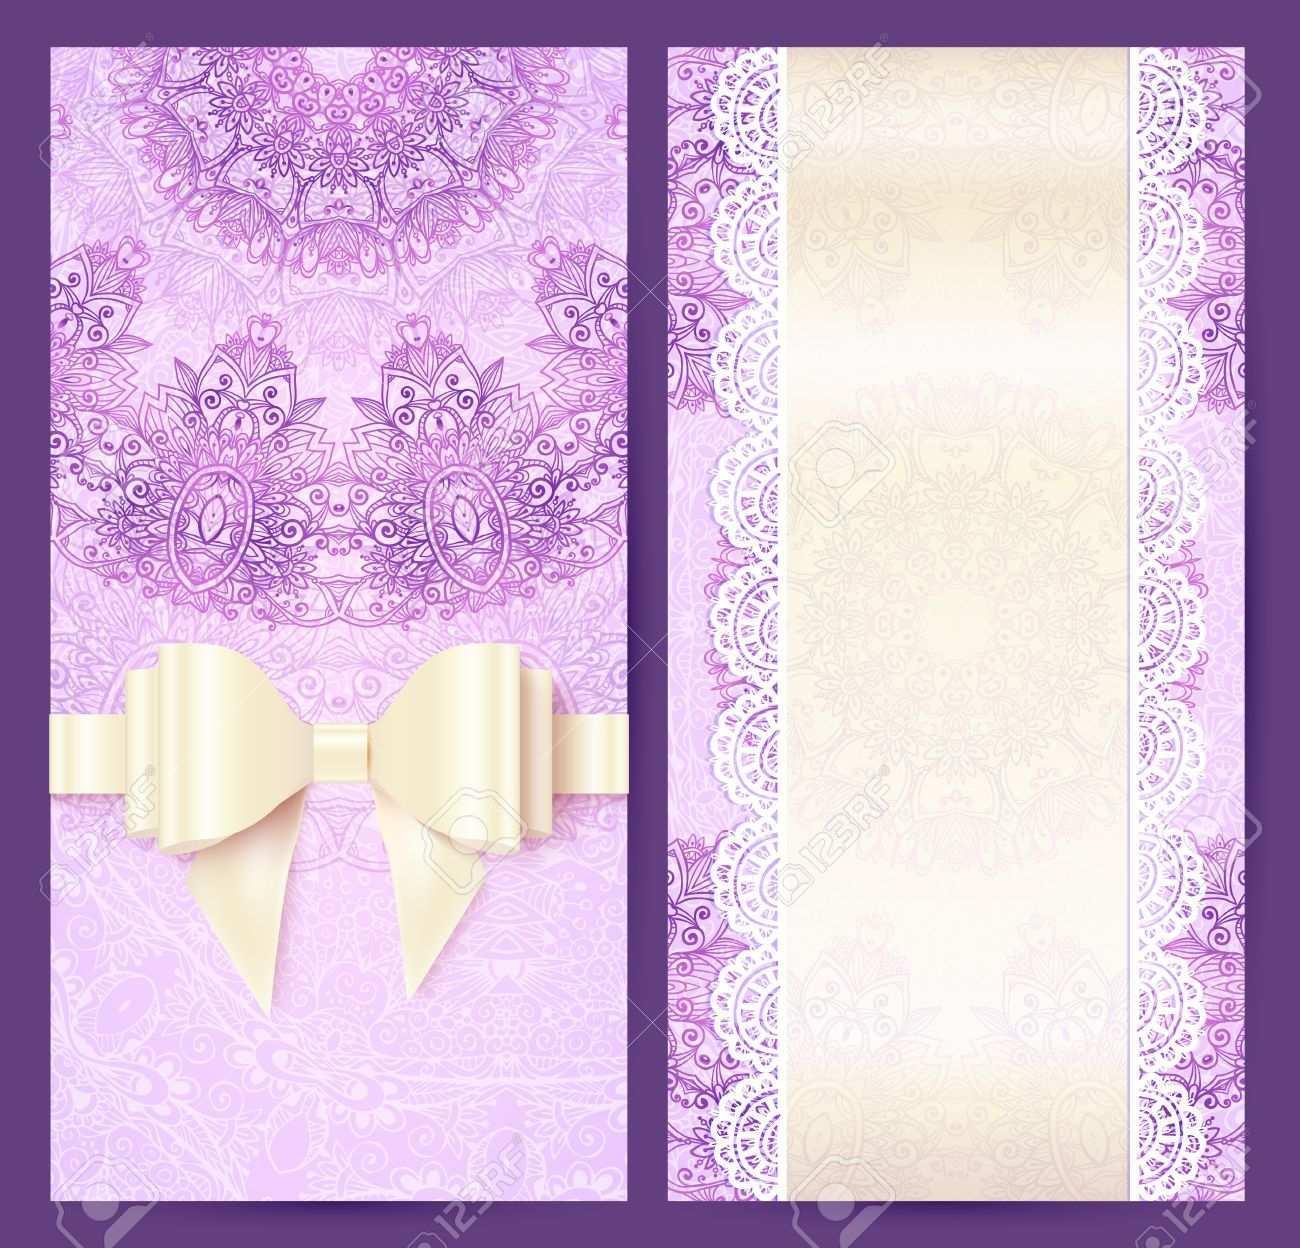 68 Format Wedding Invitation Templates Violet in Word by Wedding Invitation Templates Violet